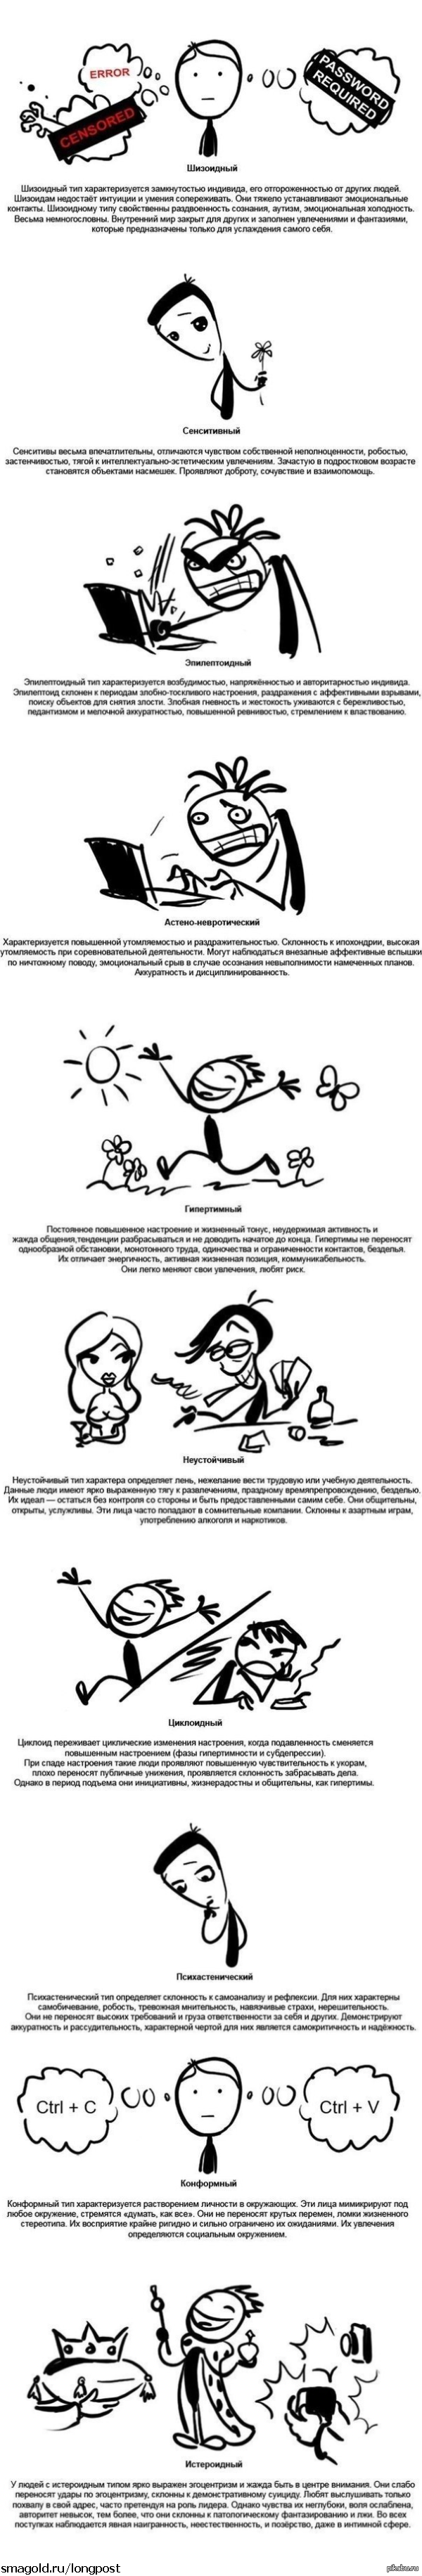 10 типов характера в Интернете